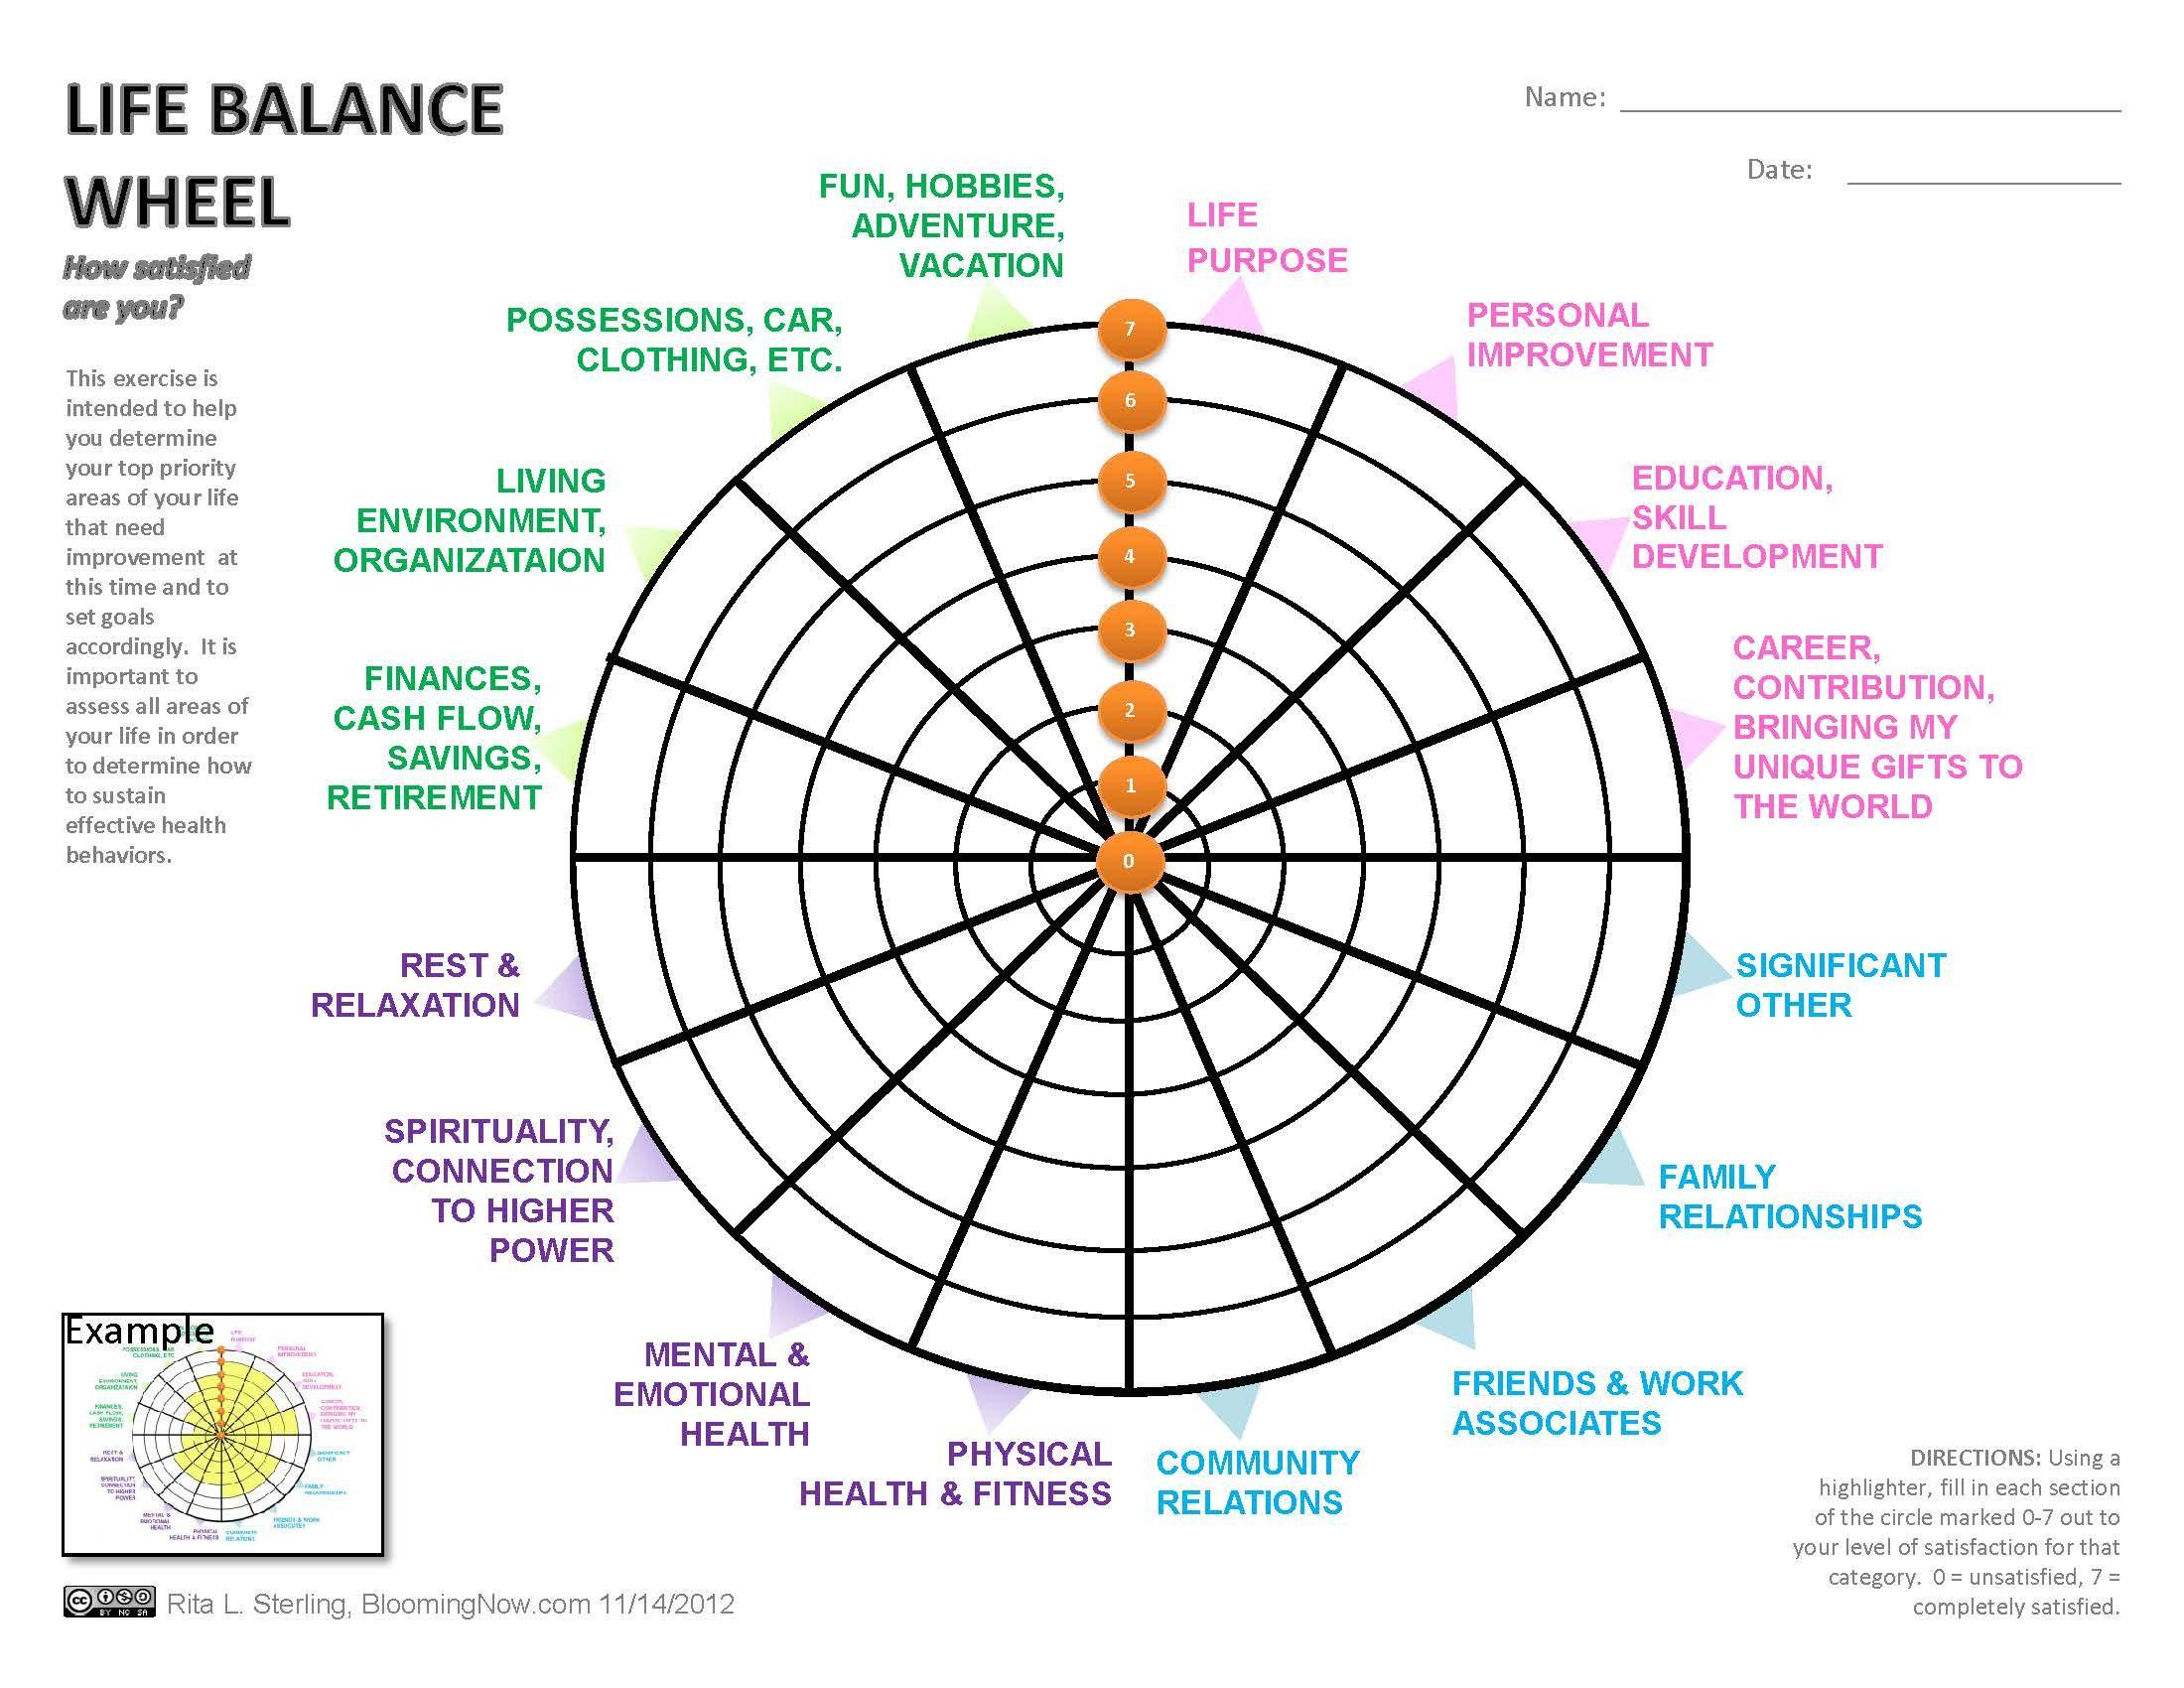 Life Balance Wheel Jpg 2 200 1 700 Pixels Tillie Ella